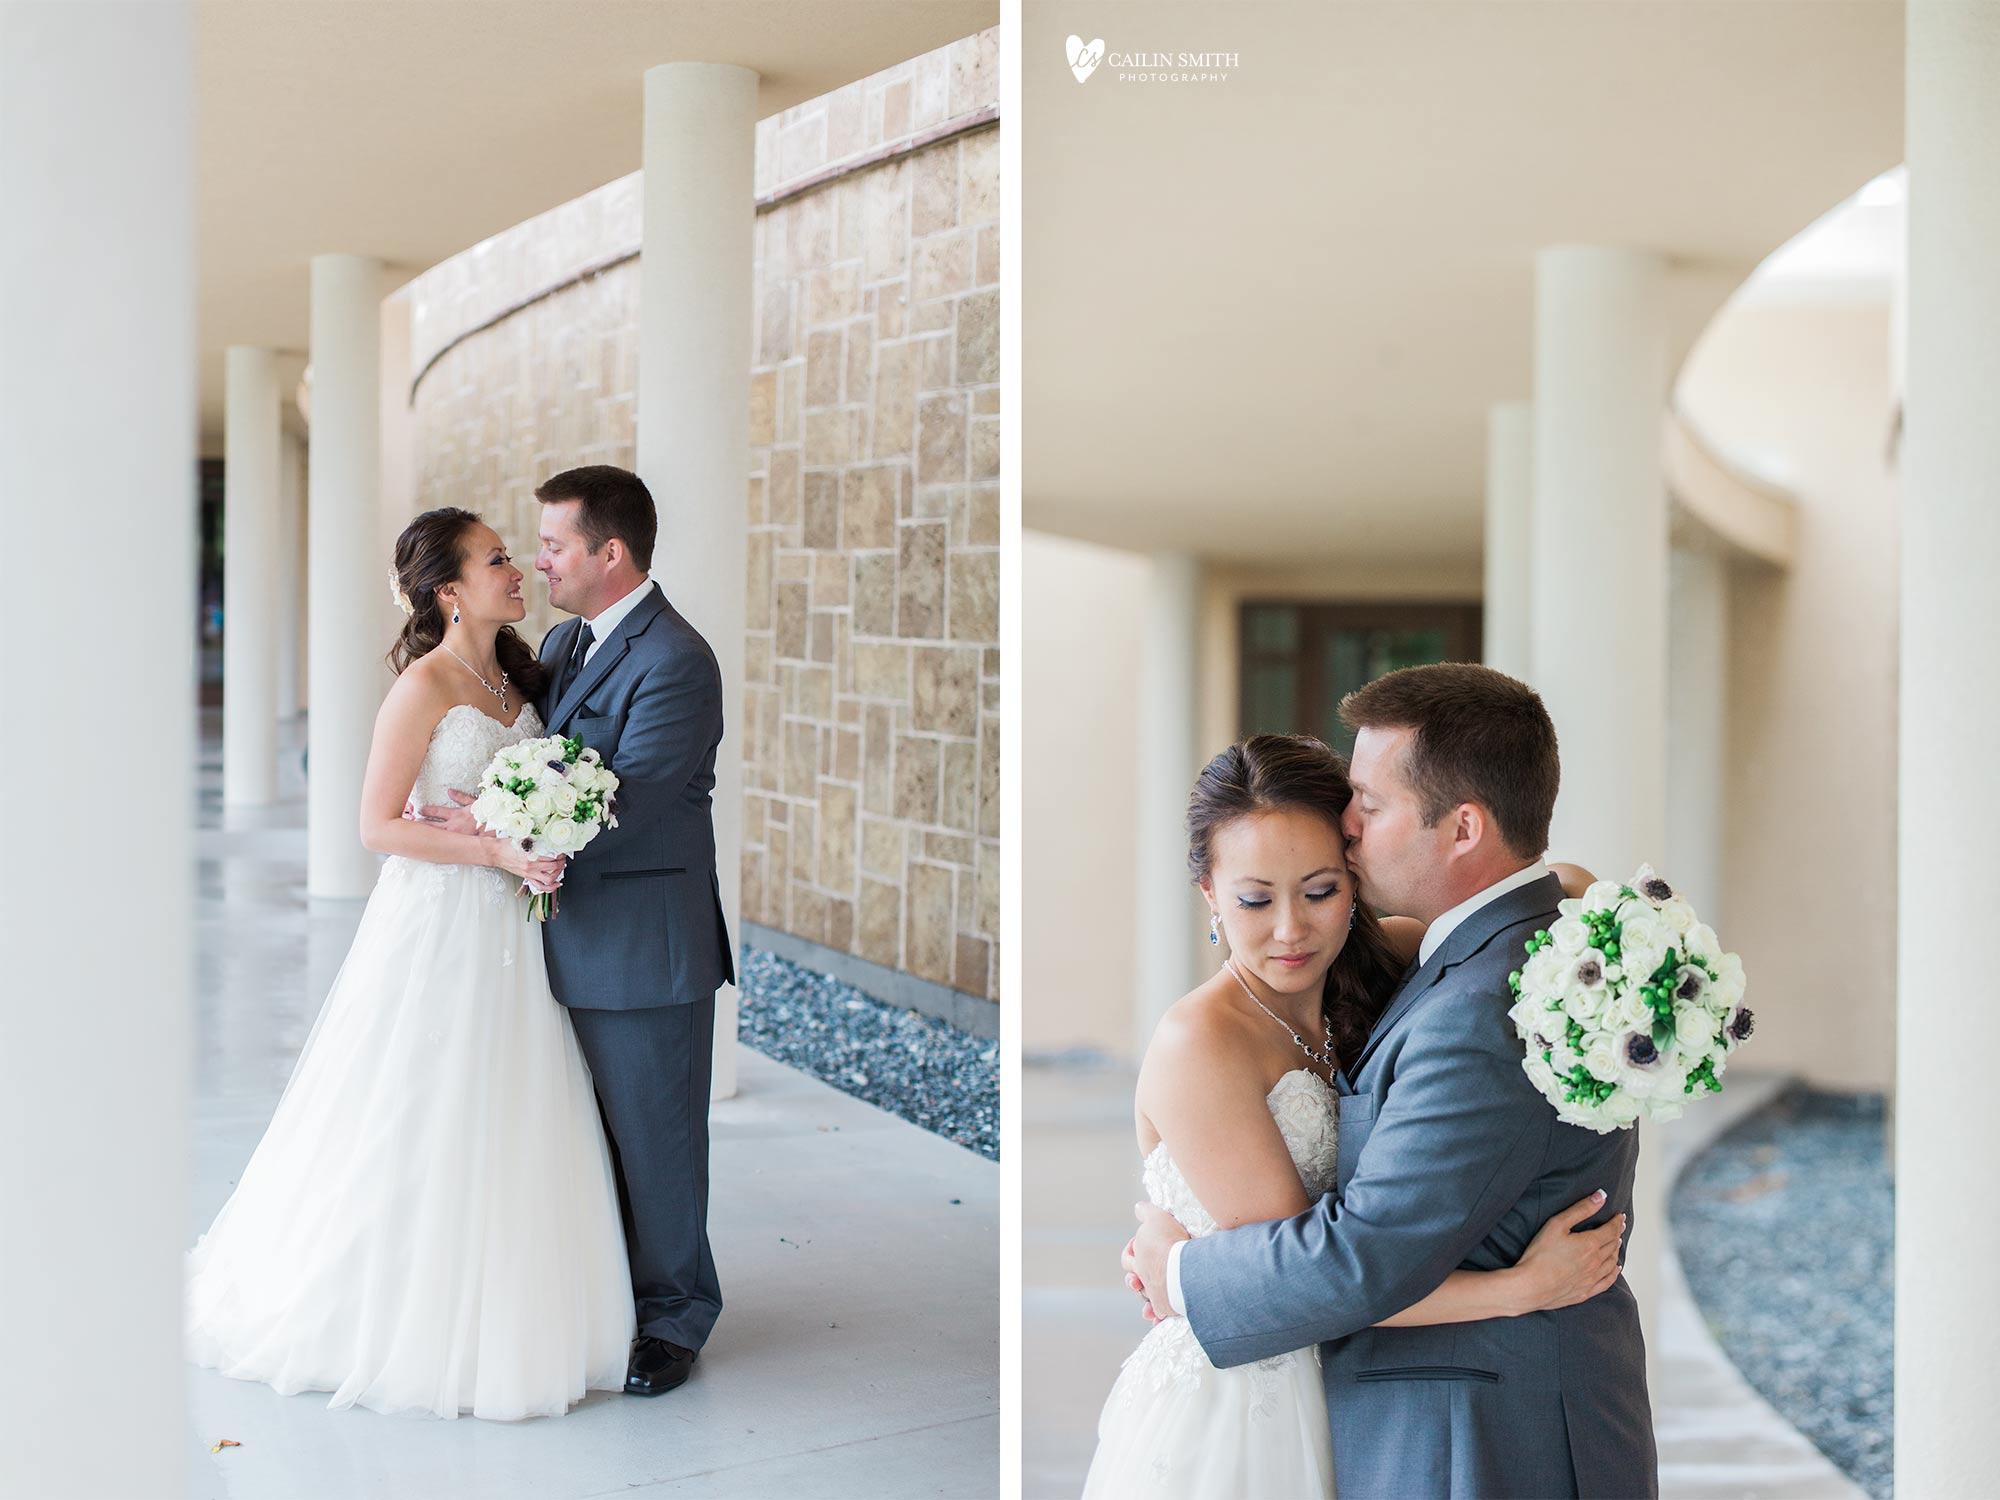 Jenifer_Dewey_Treasury_on_The_Plaza_Wedding_Photography_045.jpg